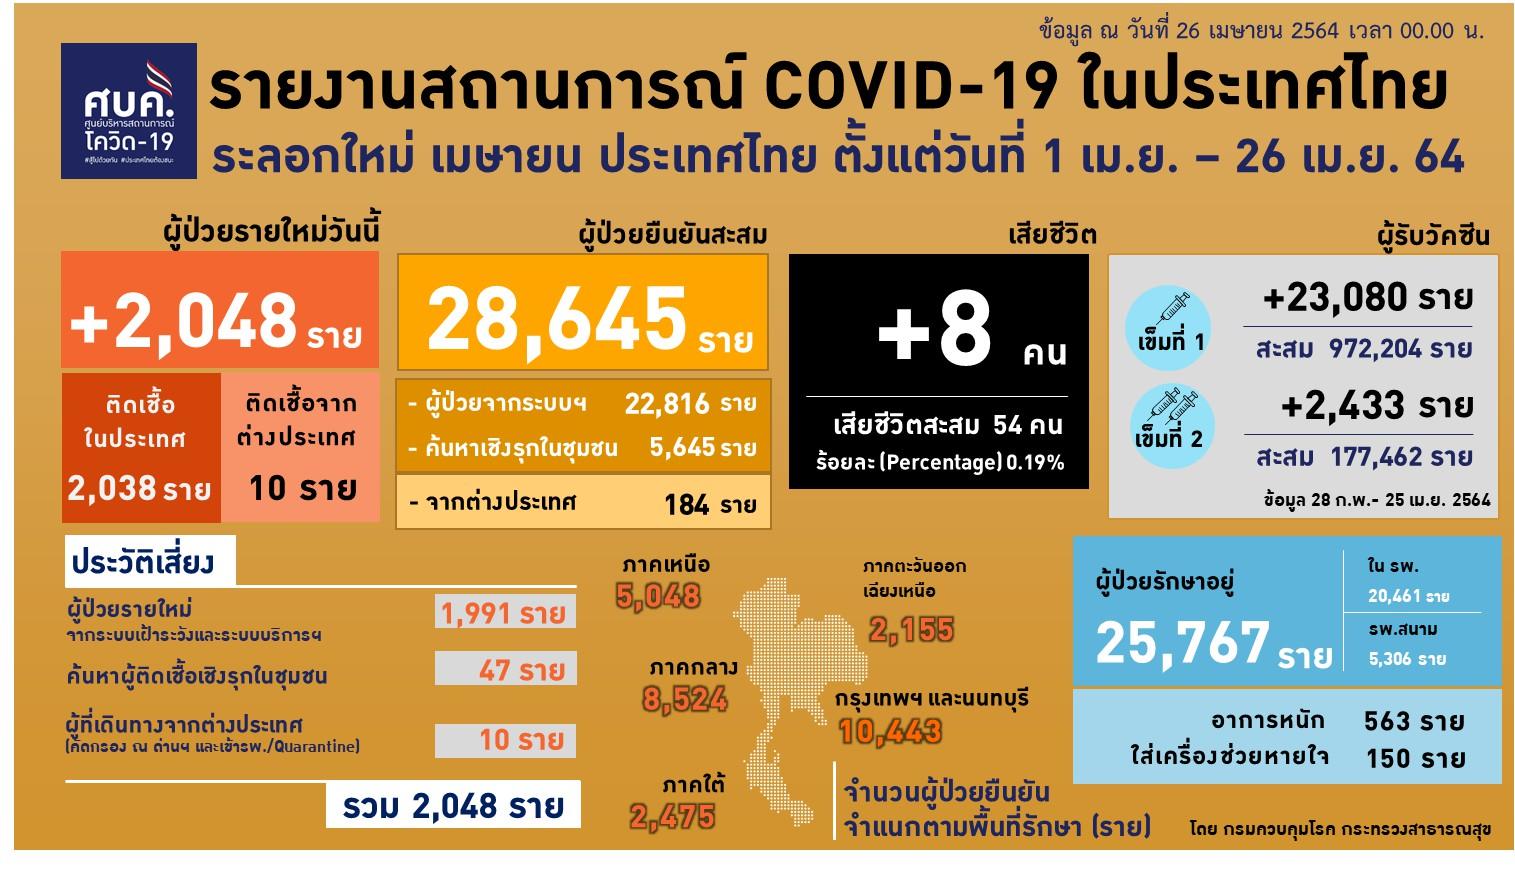 www.thaiguide.dk/images/forum/covid19/smitte%2026-04-21%20thai.jpeg